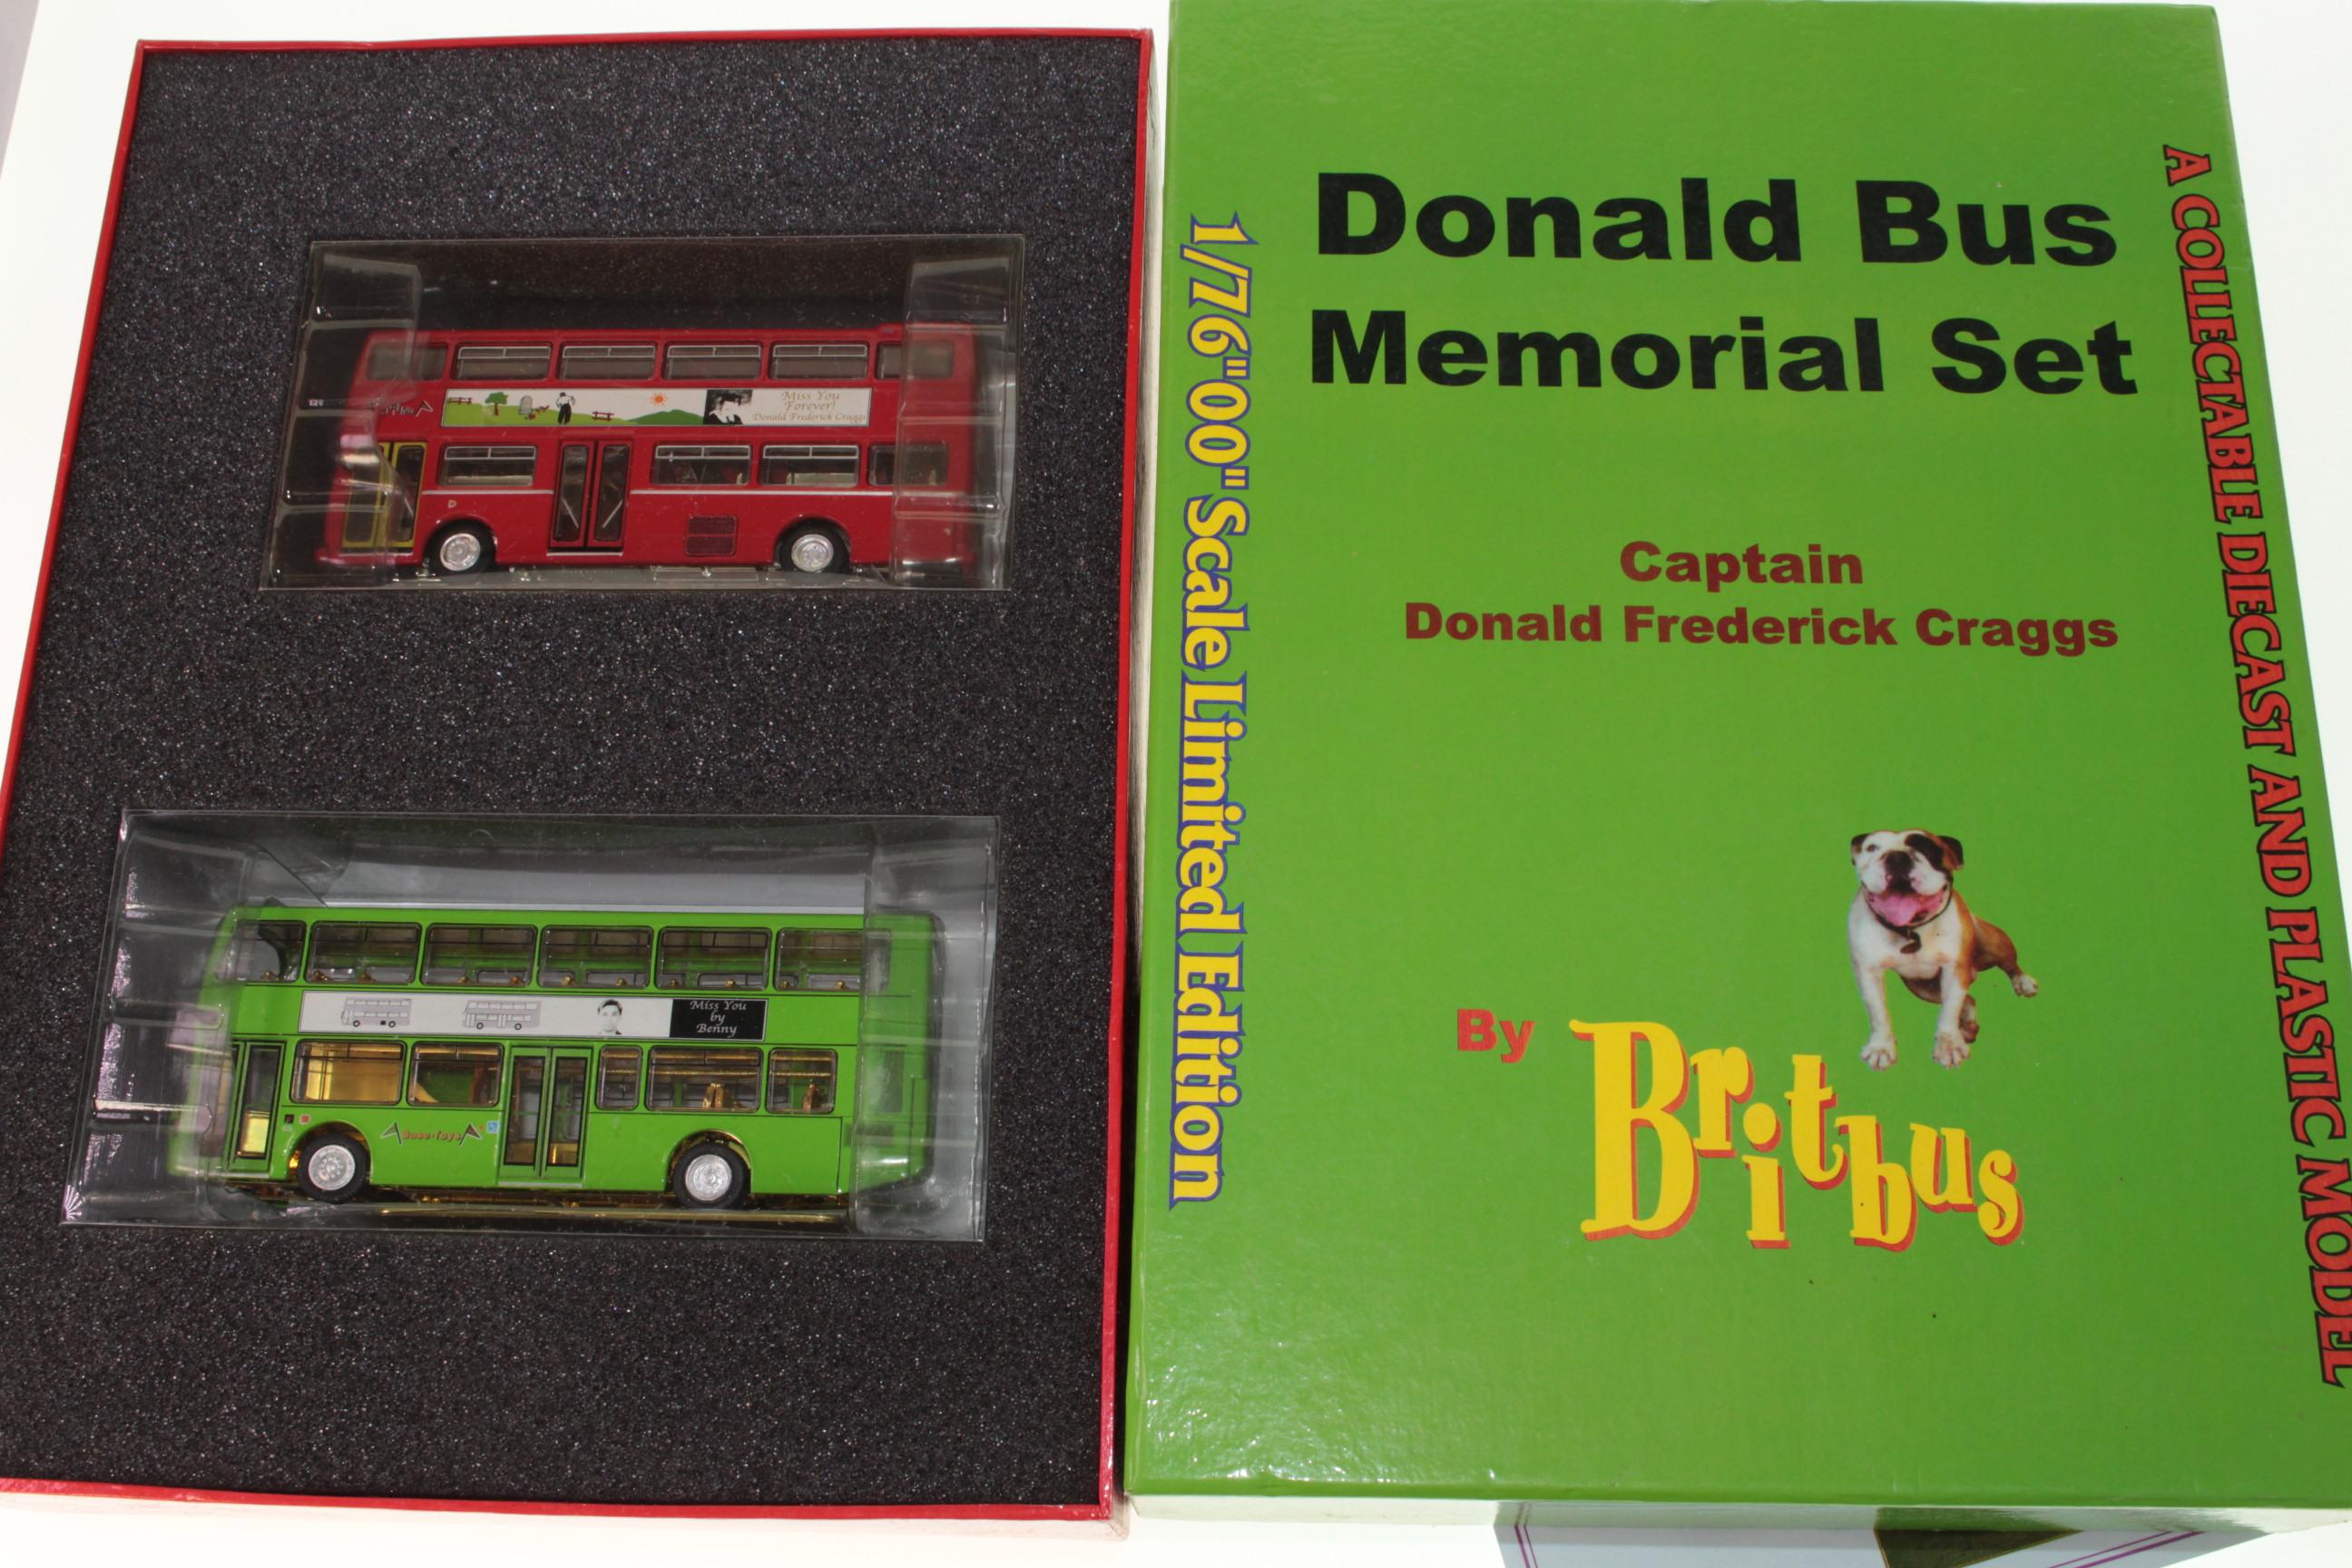 Picture Gallery for Britbus DBMS001 Donald Craggs Memorial Bus Set